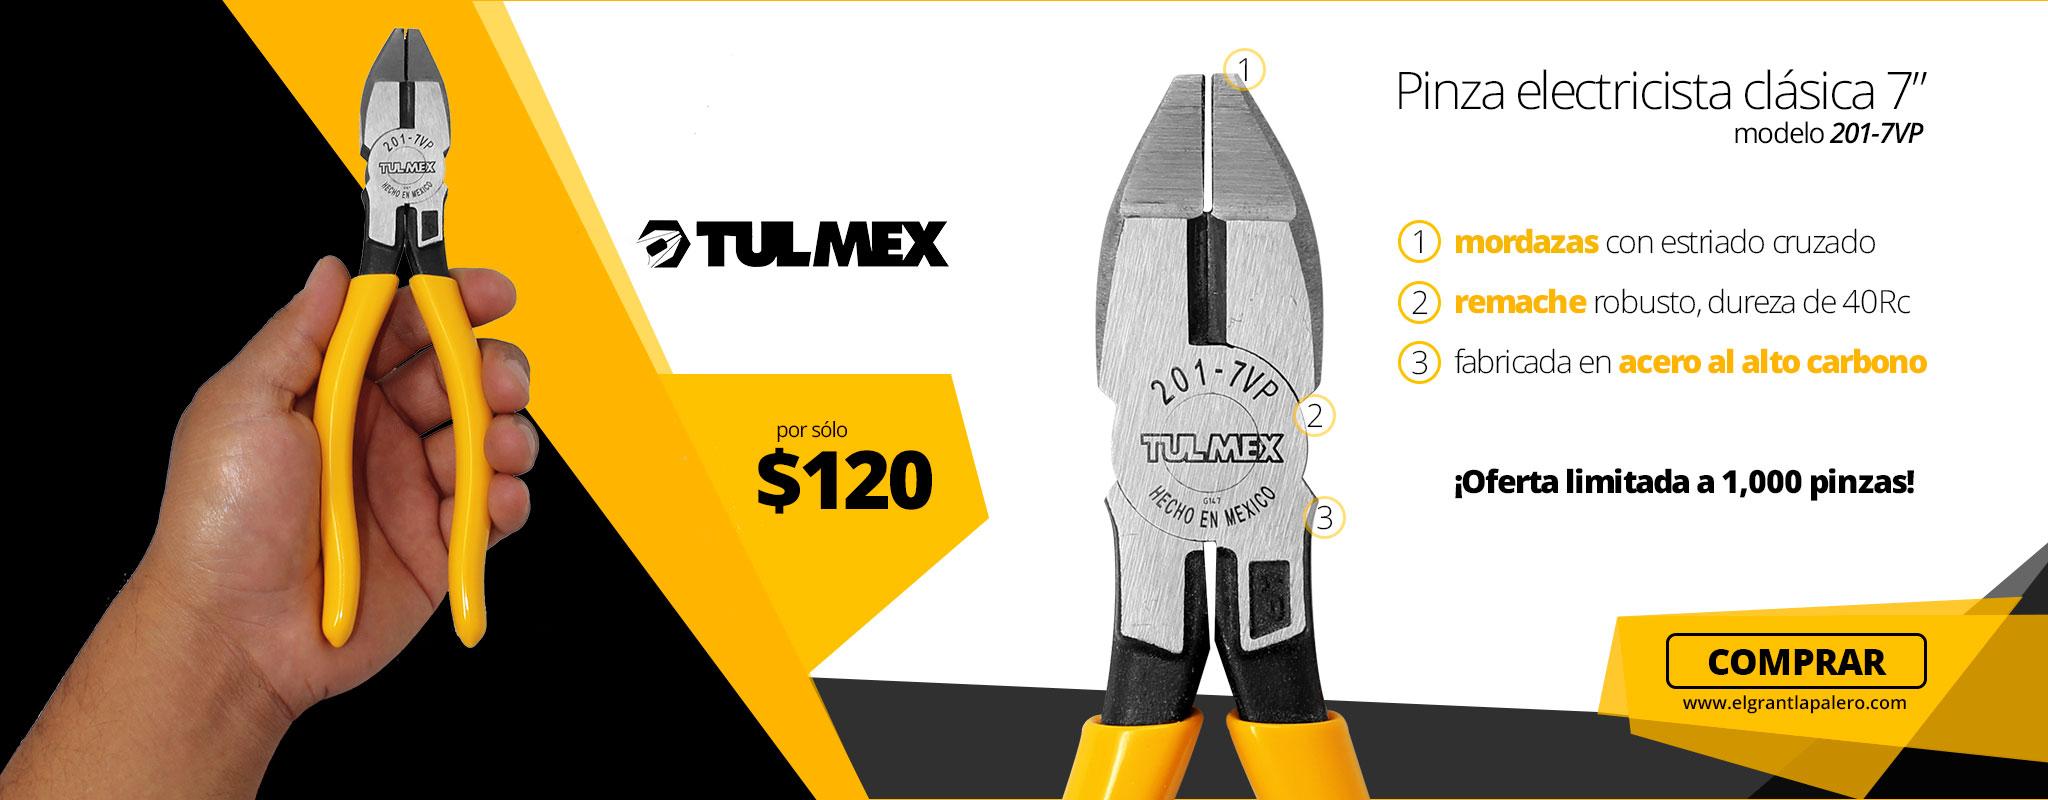 Pinza 201-7VP Tulmex en Oferta!